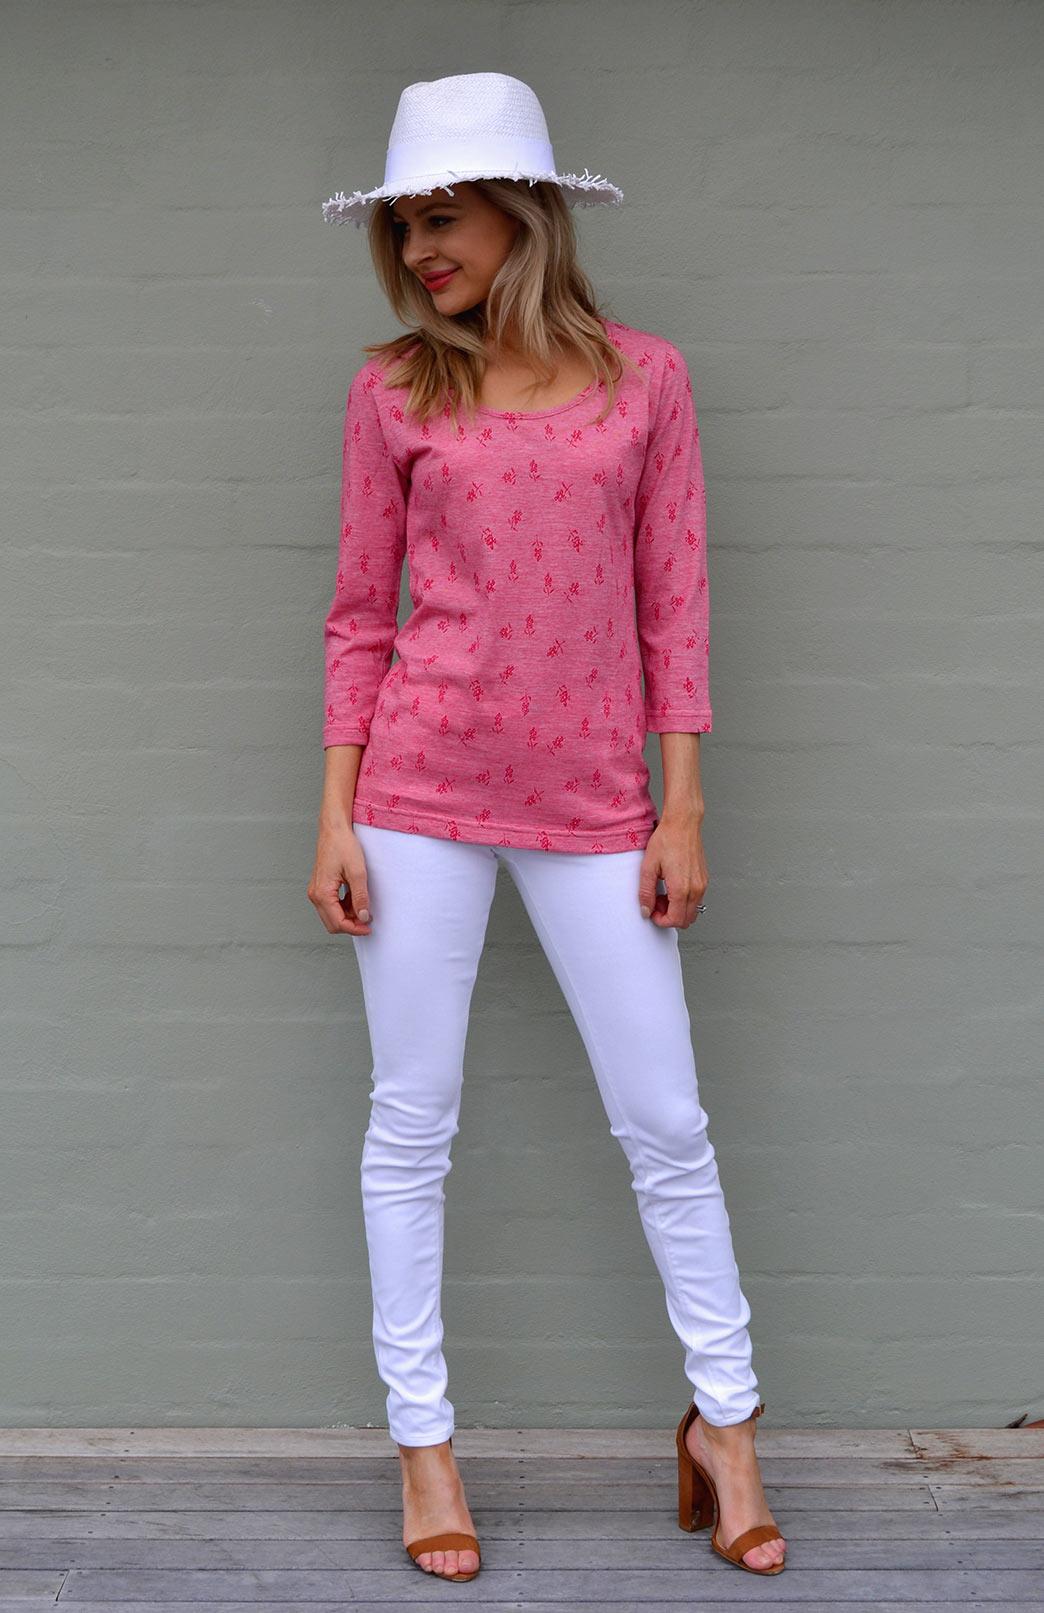 Sienna Top - Women's Red Pattern Merino Cotton Blend 3/4 Sleeved Scoop Neck Top with Fitted Body - Smitten Merino Tasmania Australia